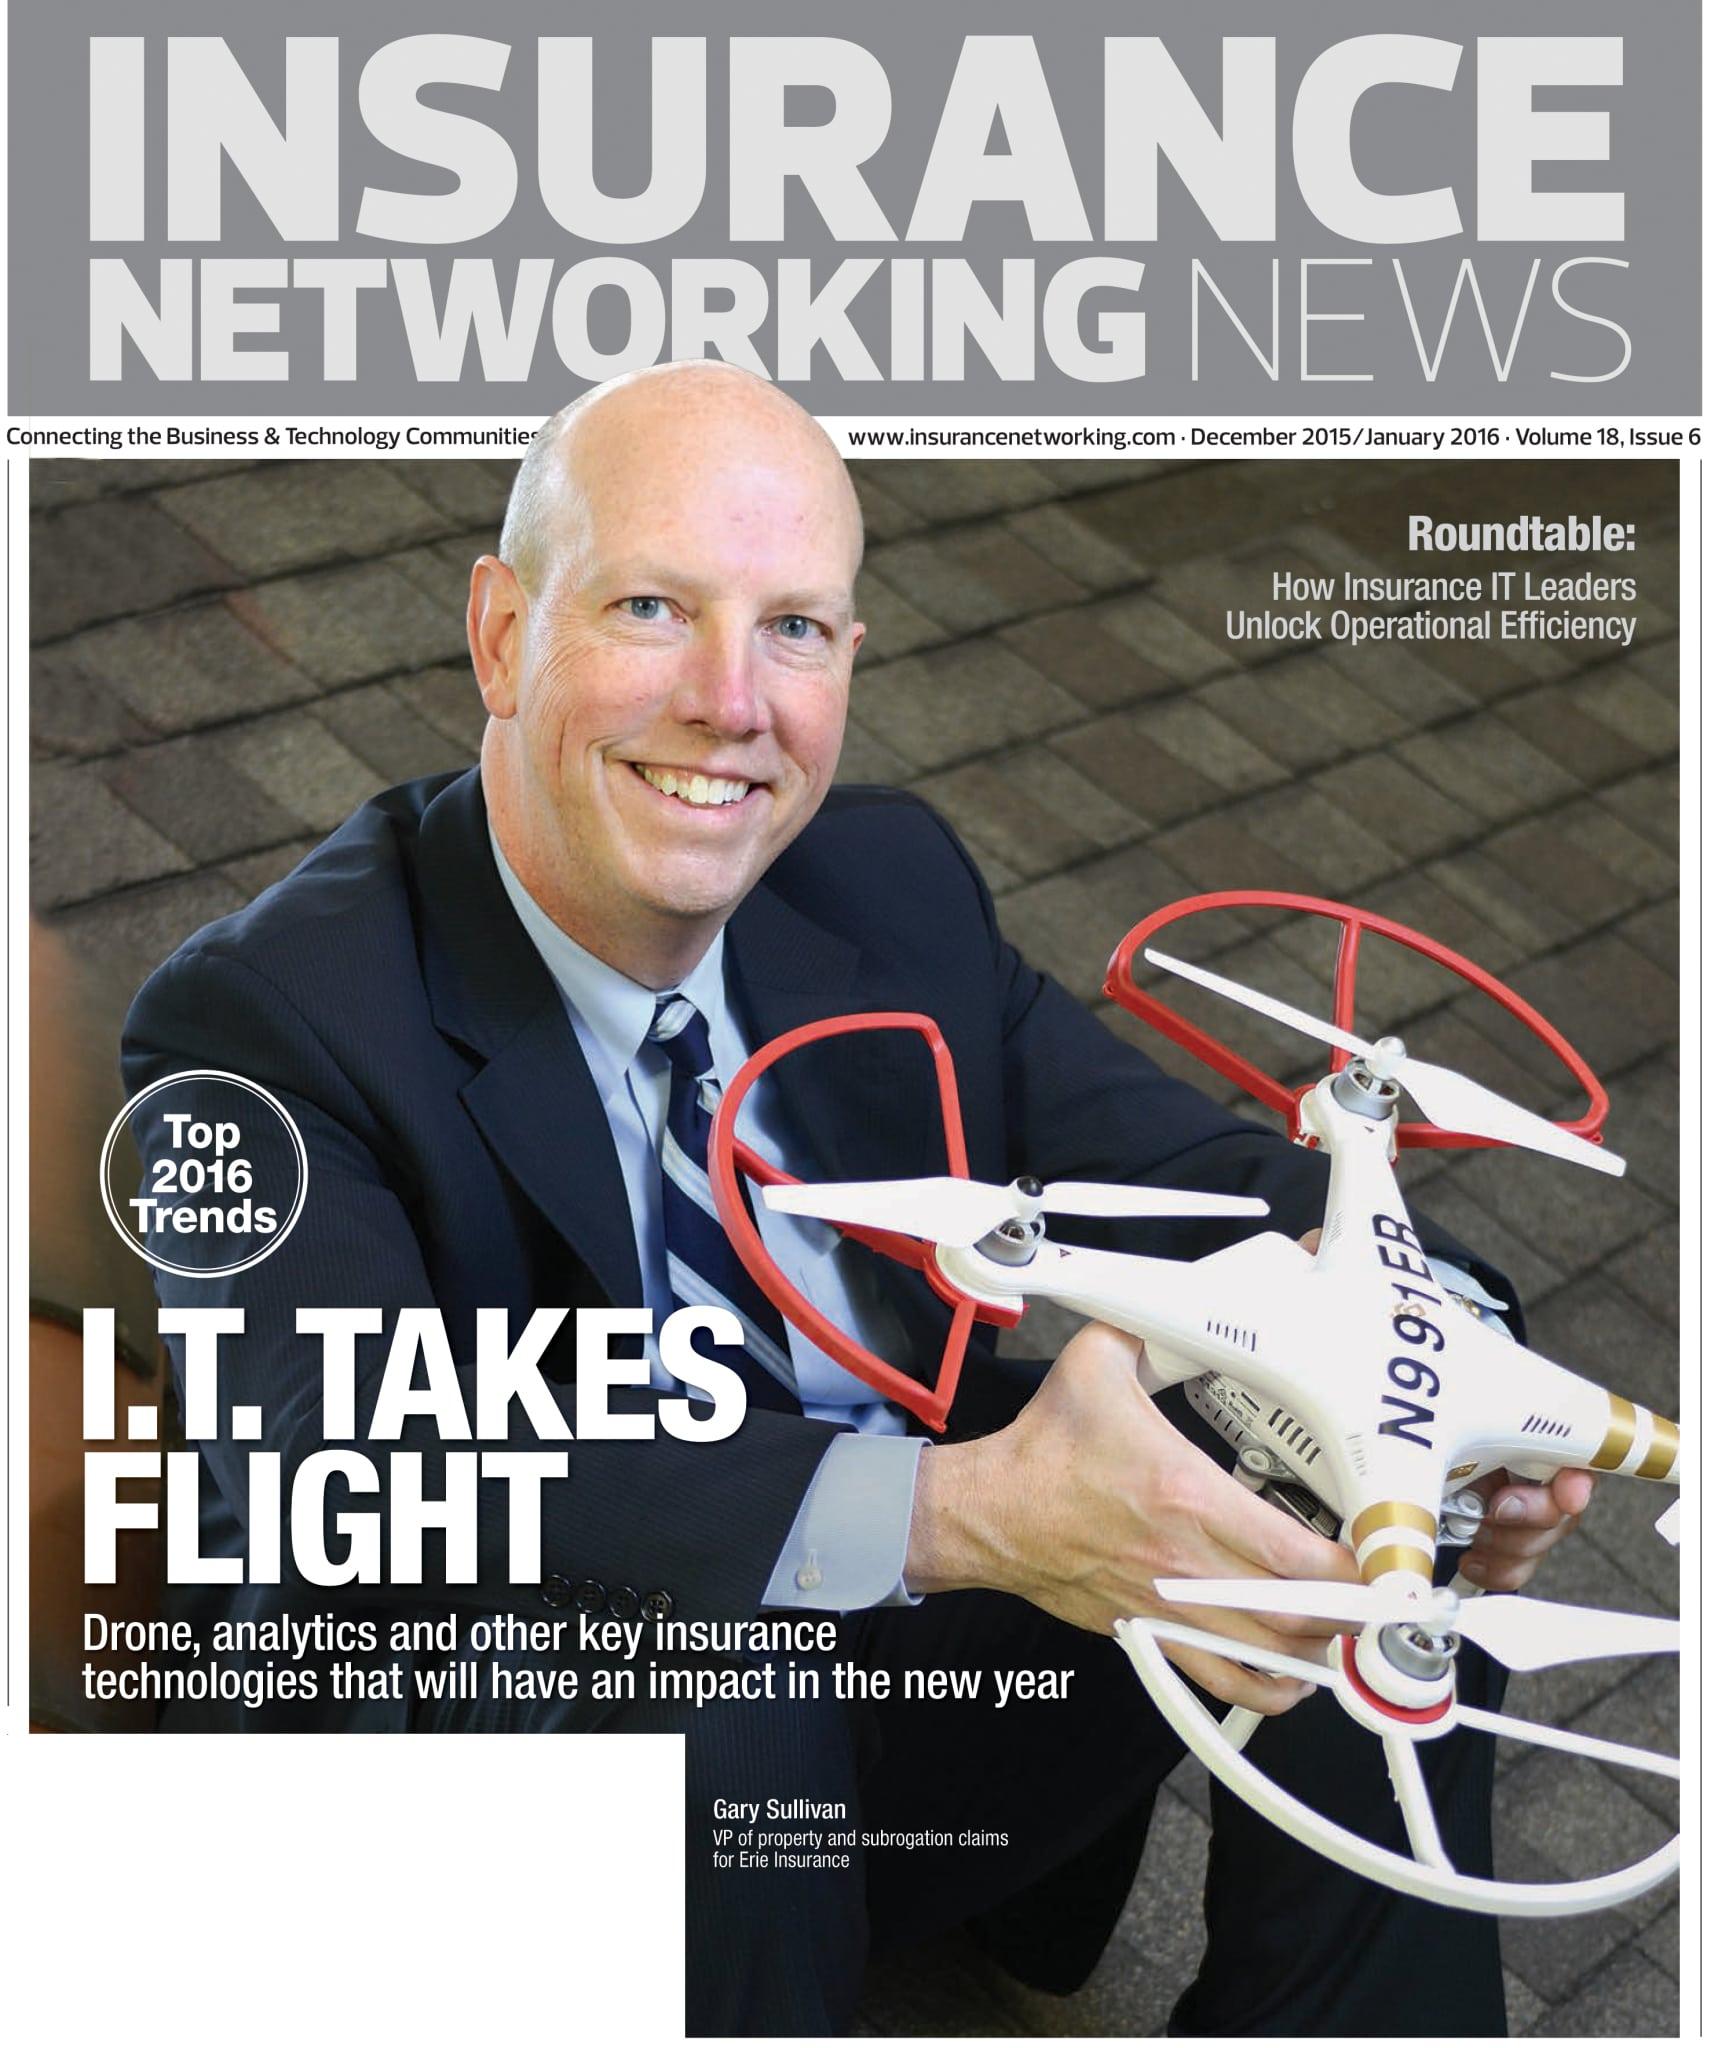 INSURANCE NETWORKING NEWS_B2B_Standalone Digital Magazine